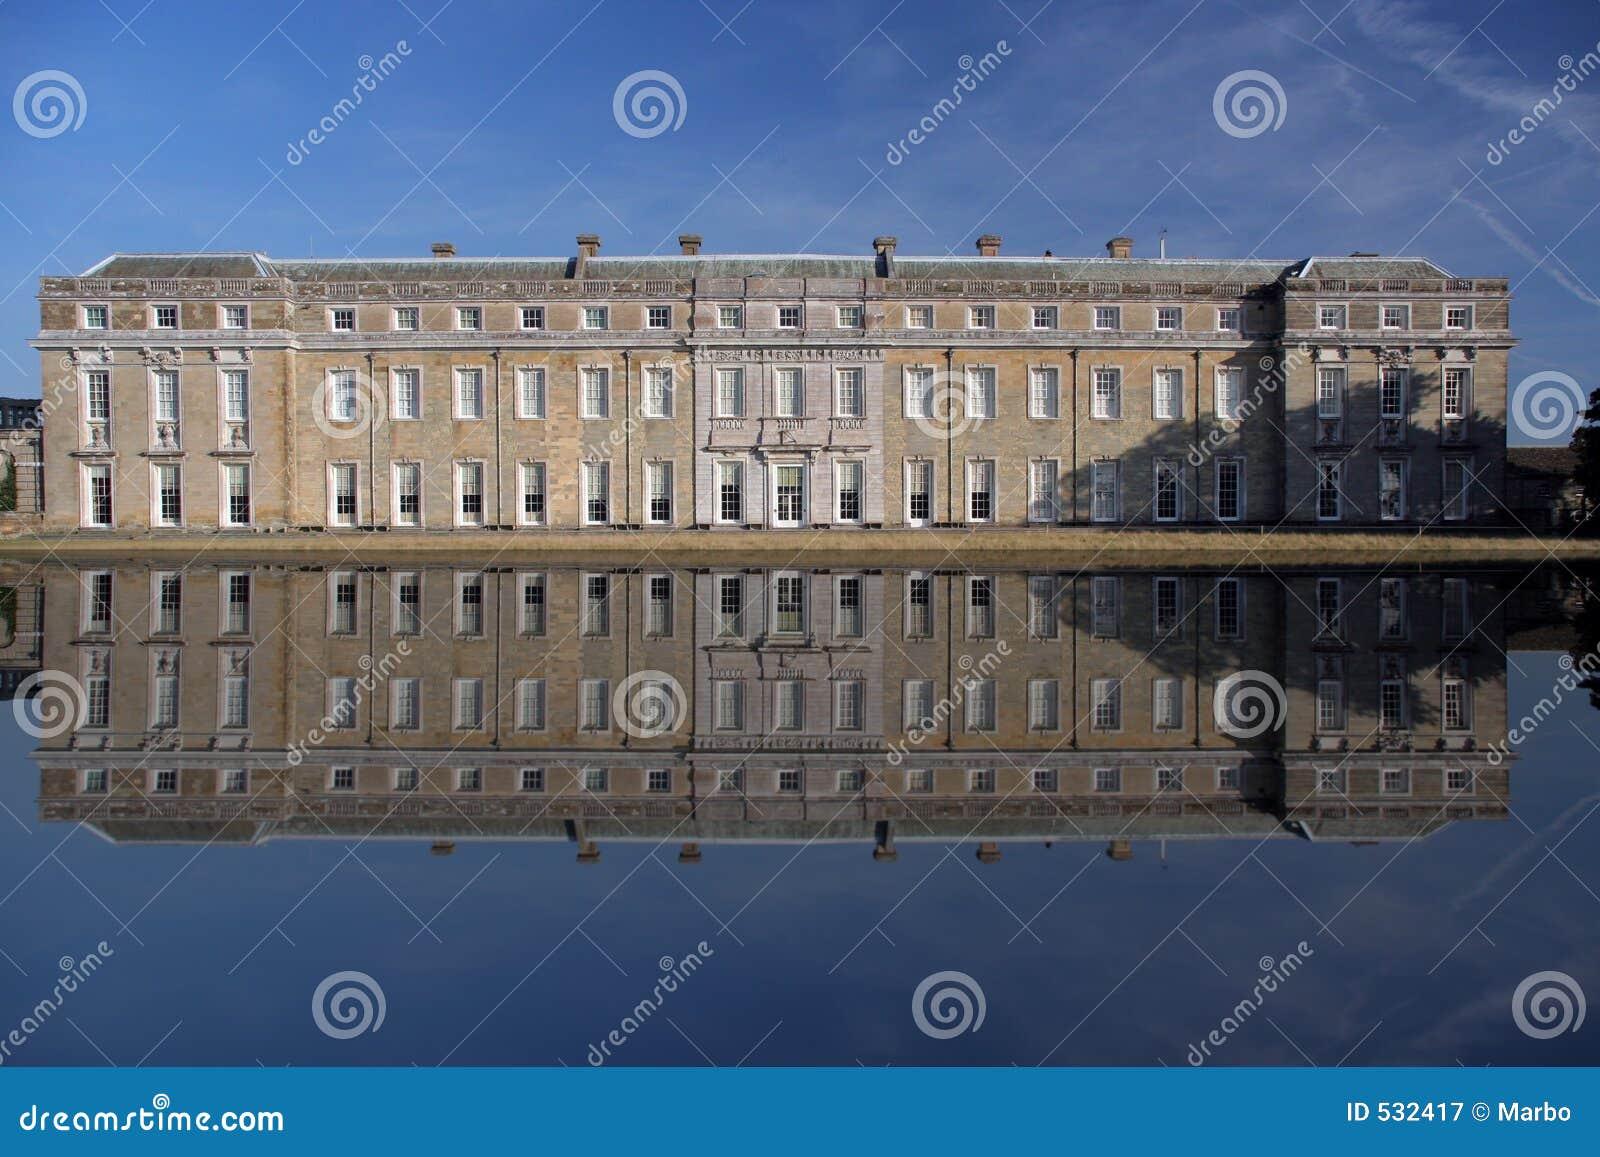 Download 房子petworth 库存图片. 图片 包括有 豪宅, 反映, 有历史, 英语, 历史记录, 房子, 布琼布拉 - 532417